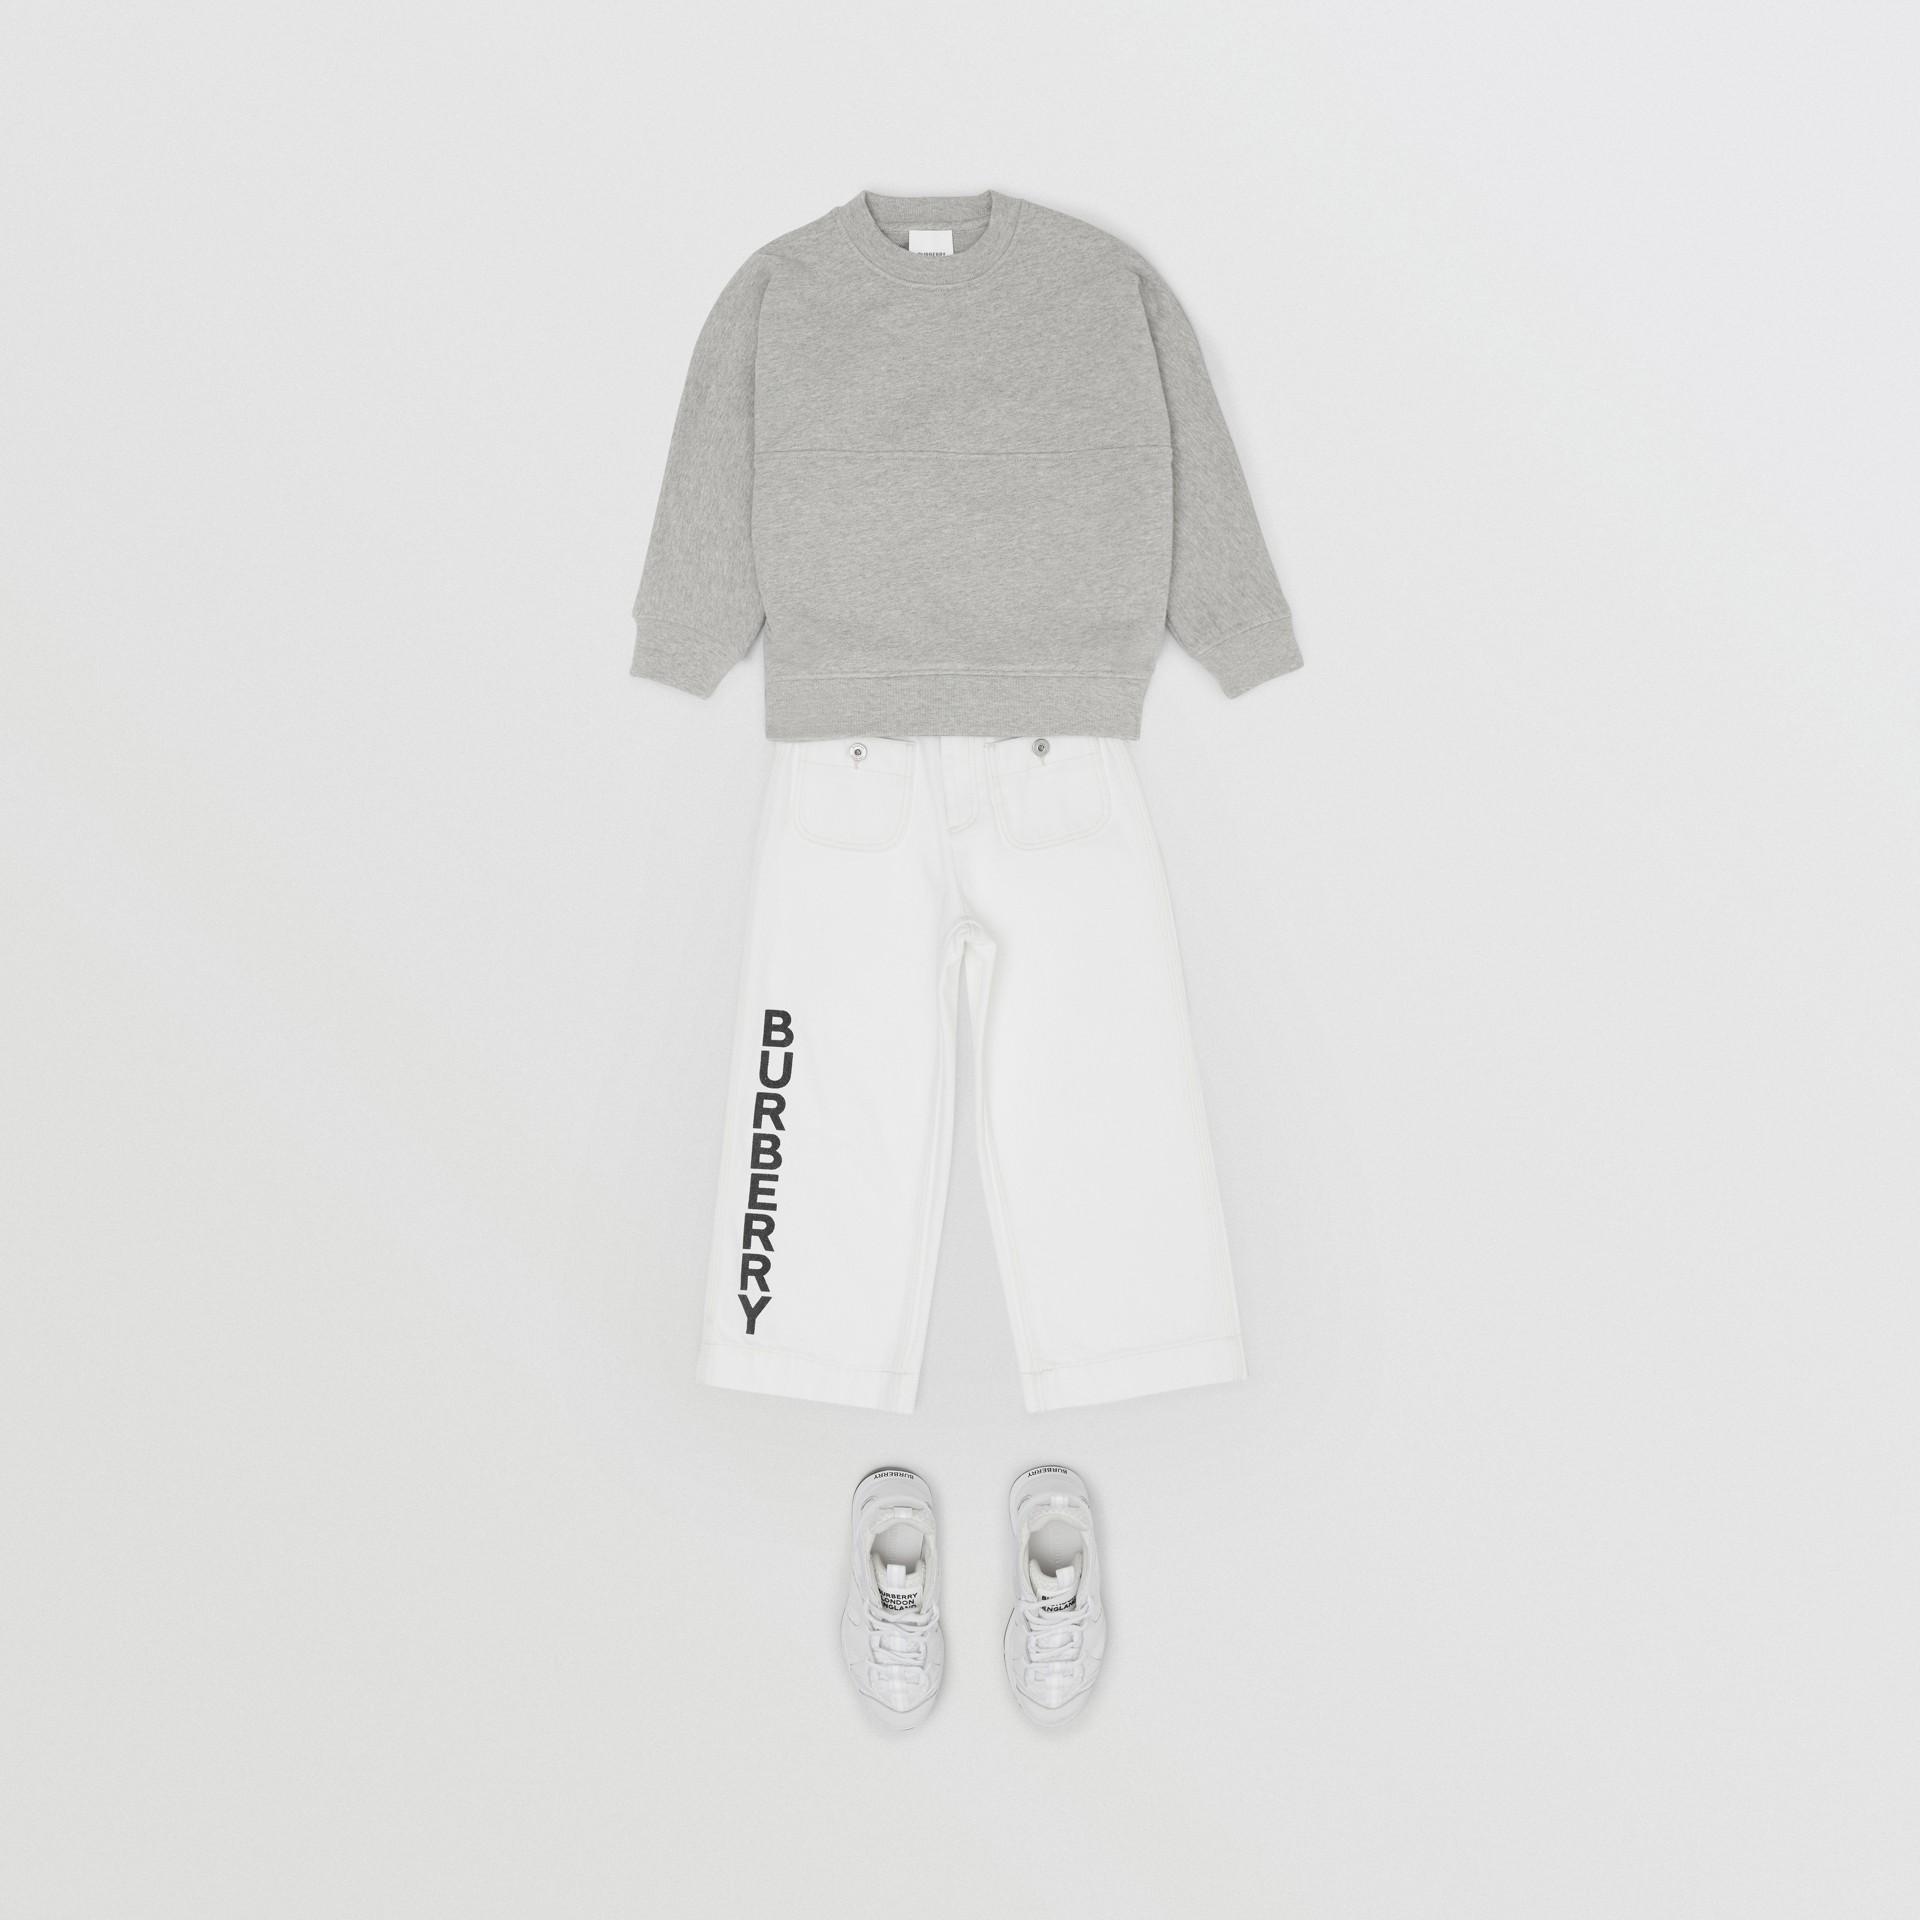 Logo Print Cotton Sweatshirt in Grey Melange/black   Burberry United States - gallery image 3